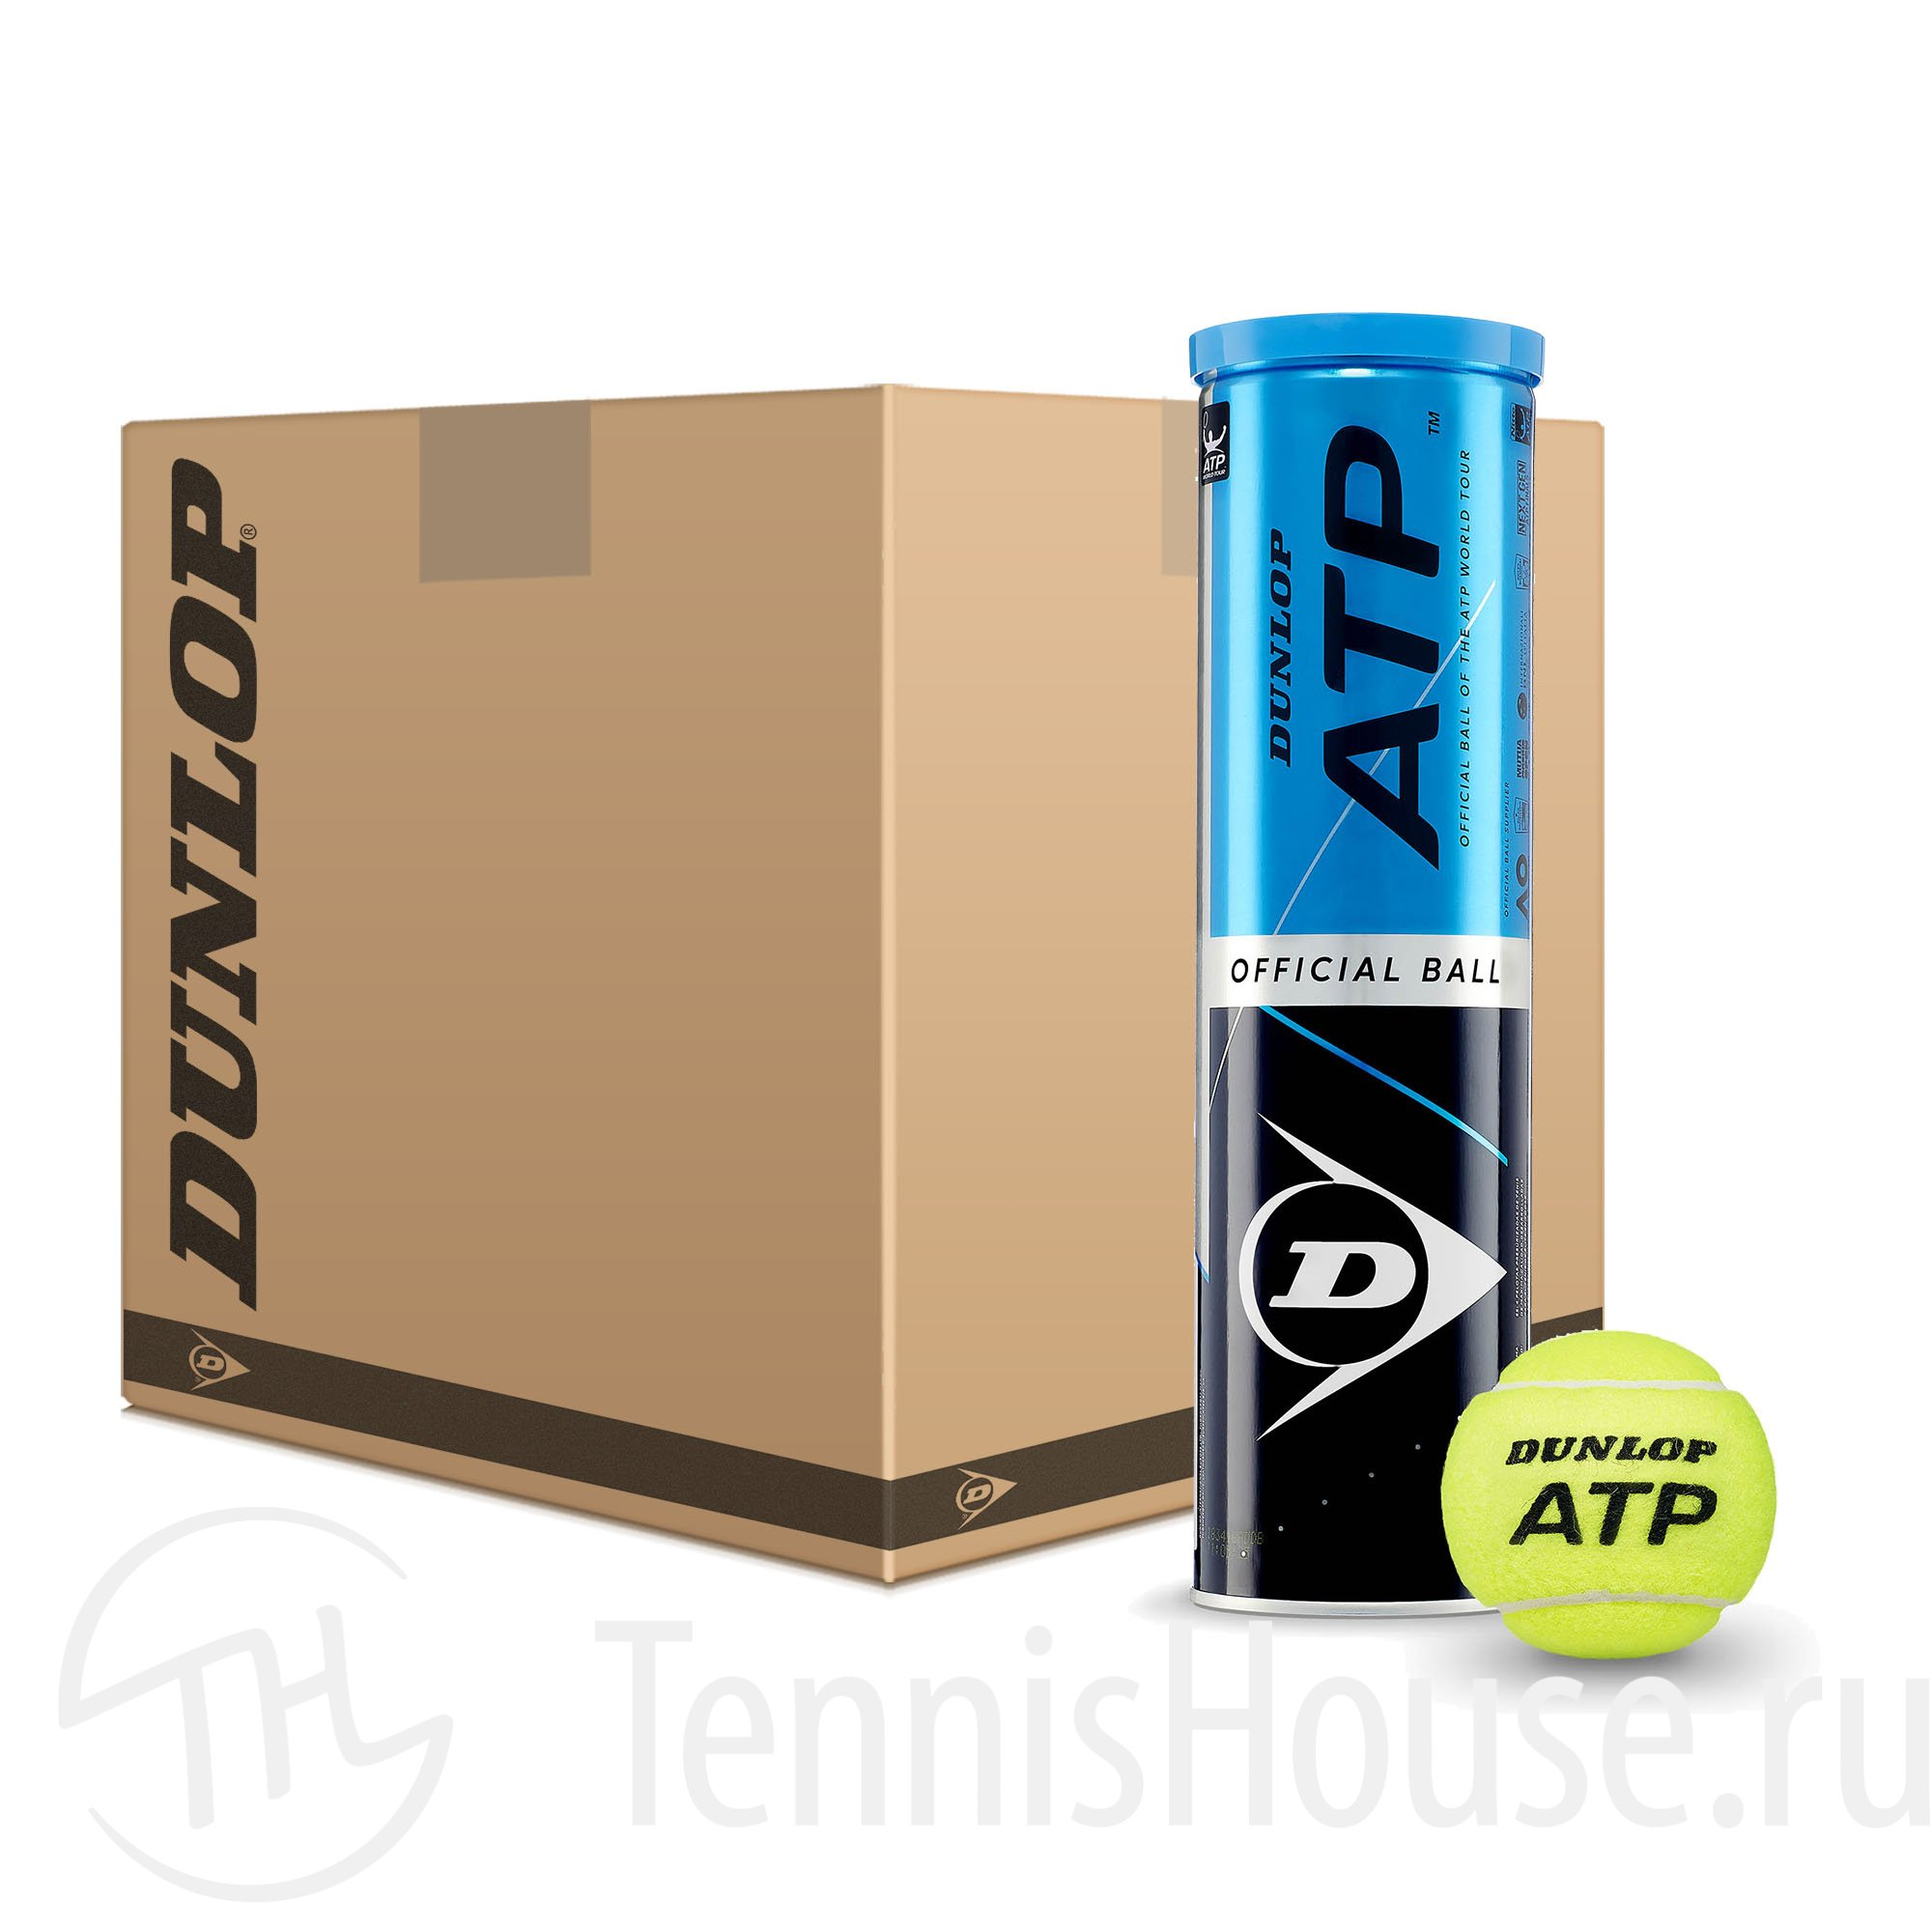 Dunlop ATP DNP-ATP72